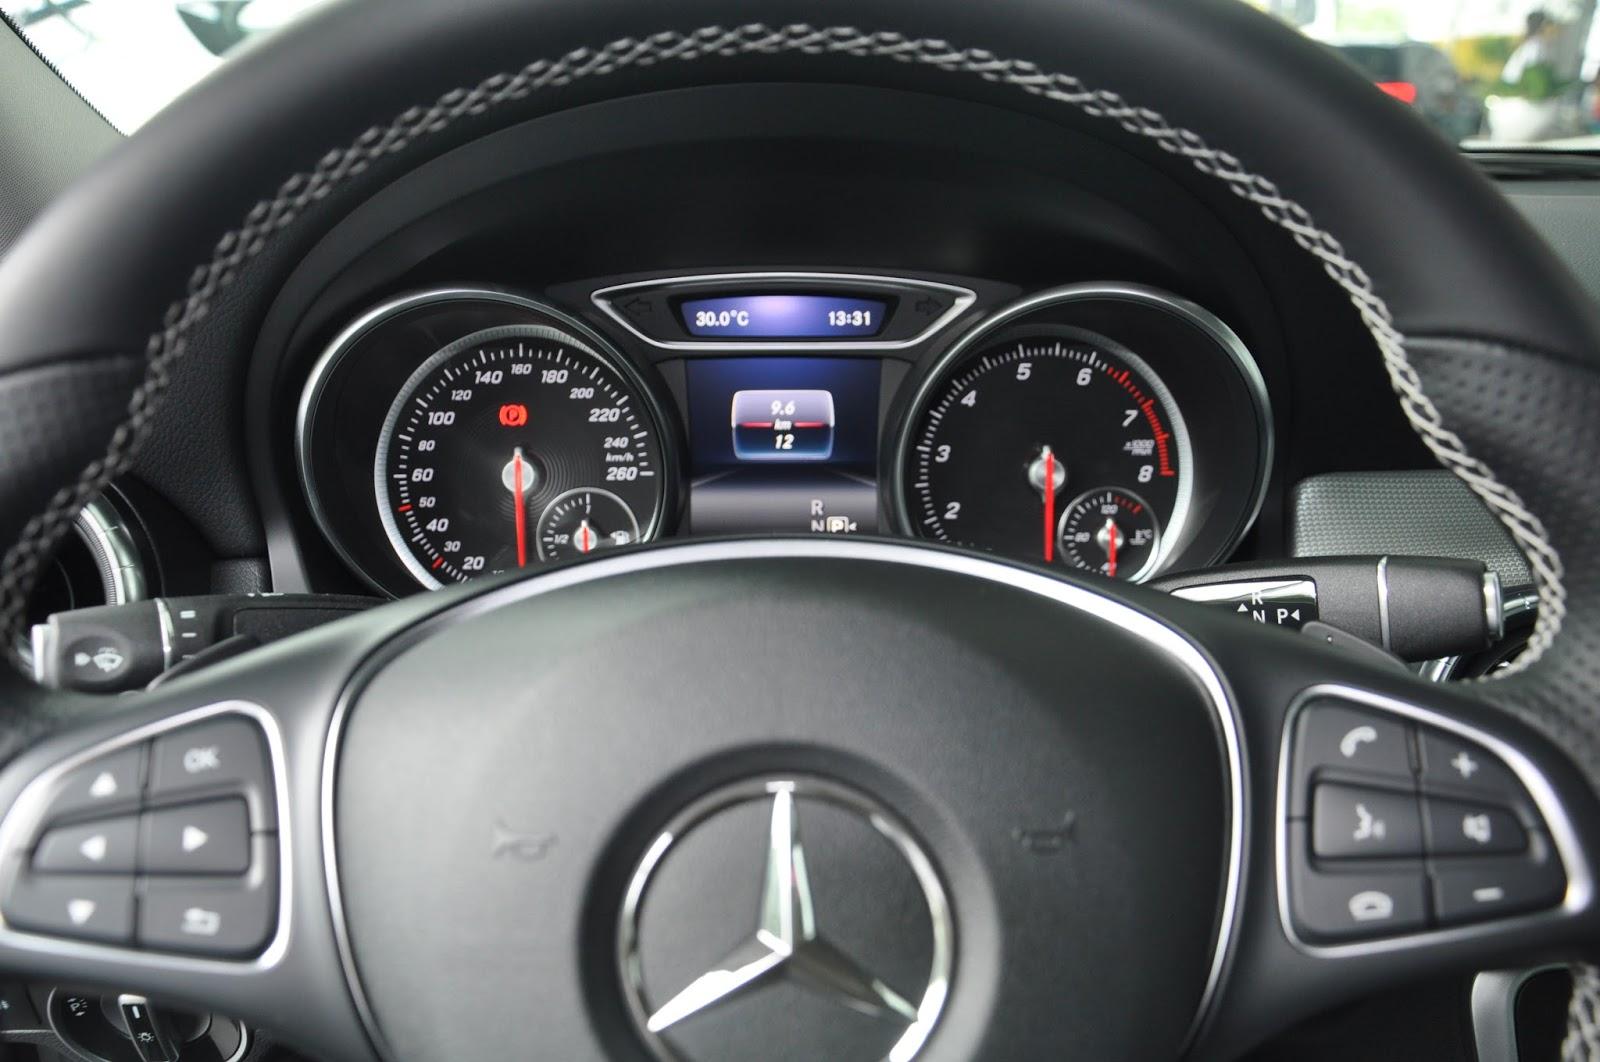 Nội thất xe Mercedes Benz CLA 200 New Model màu nâu 03